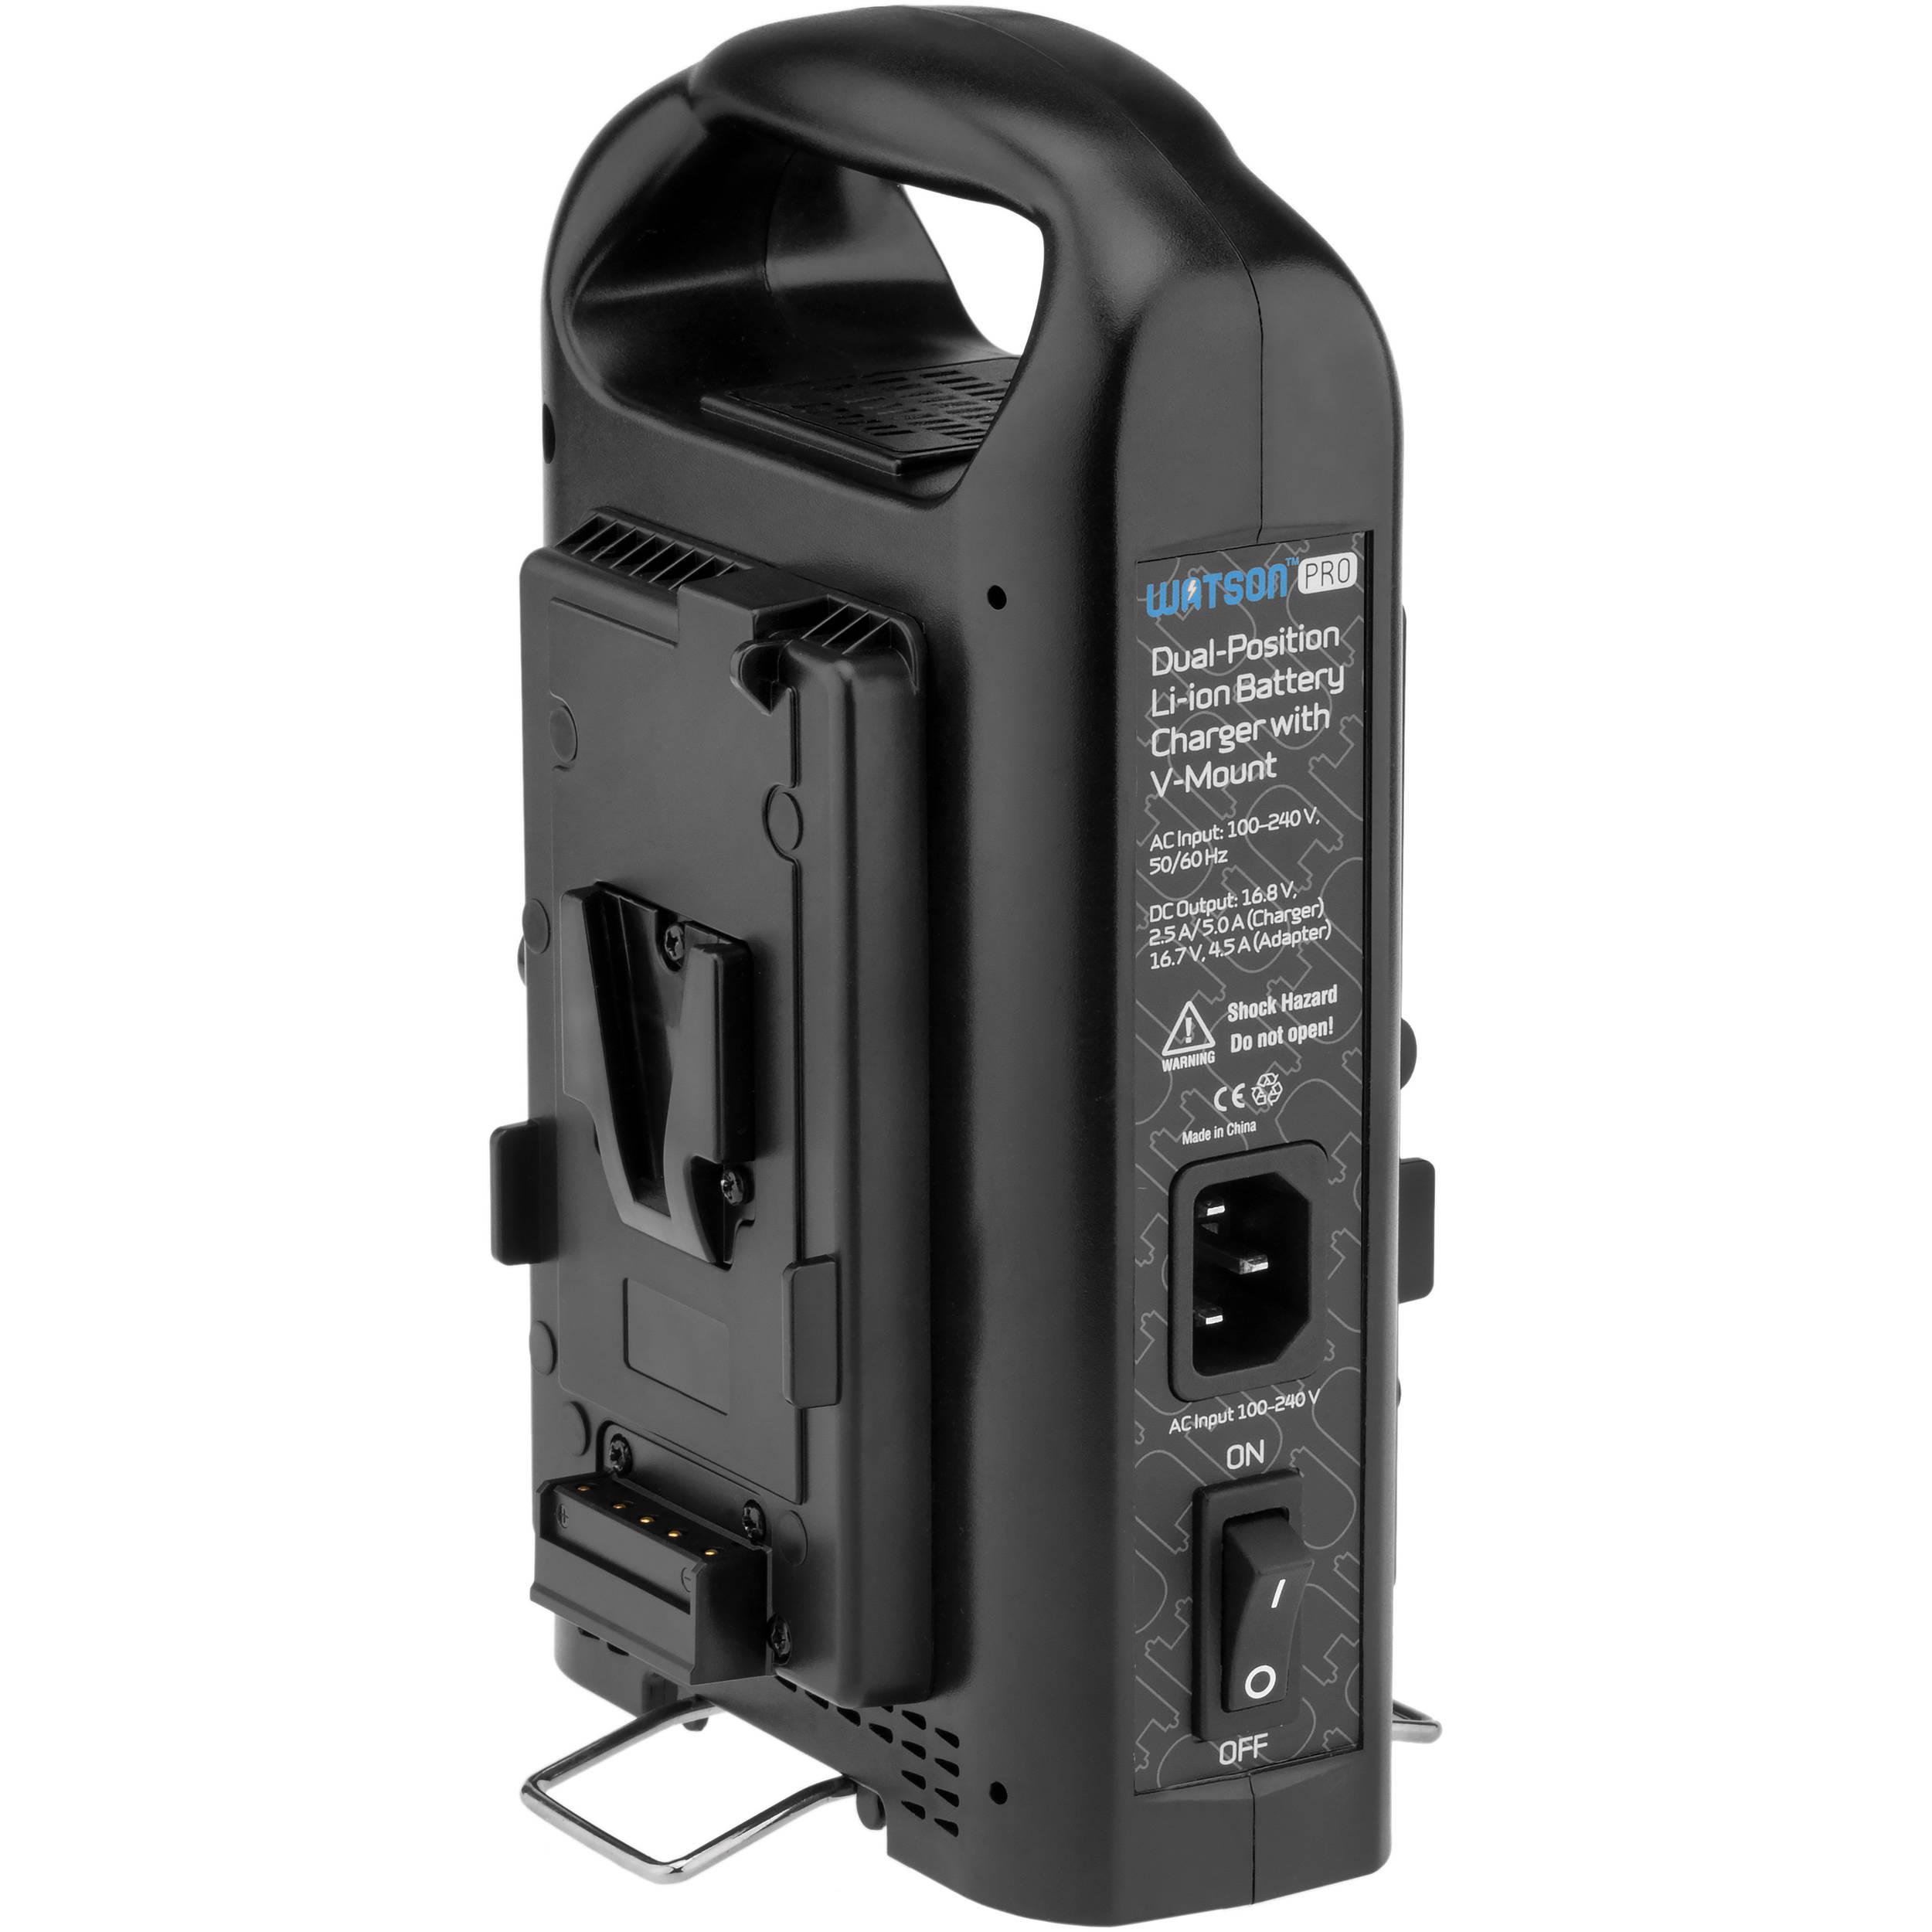 Watson Pro Dual Position Li Ion Battery